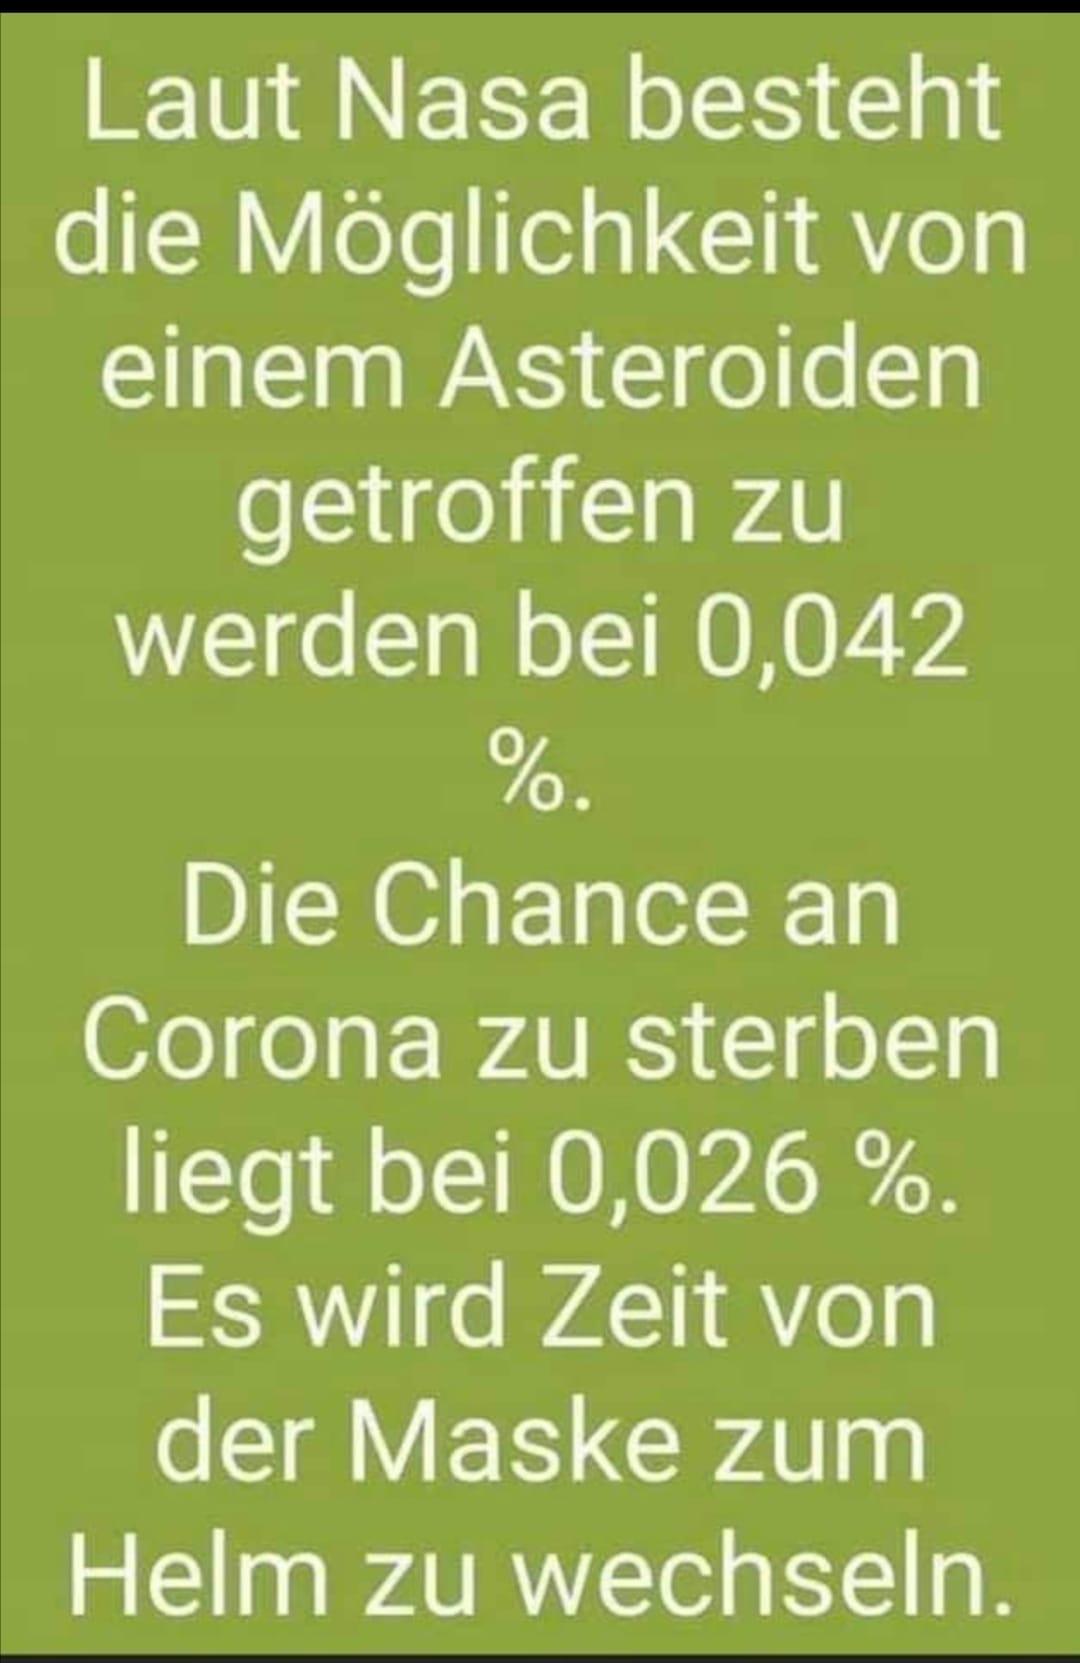 asteroiden.jpg